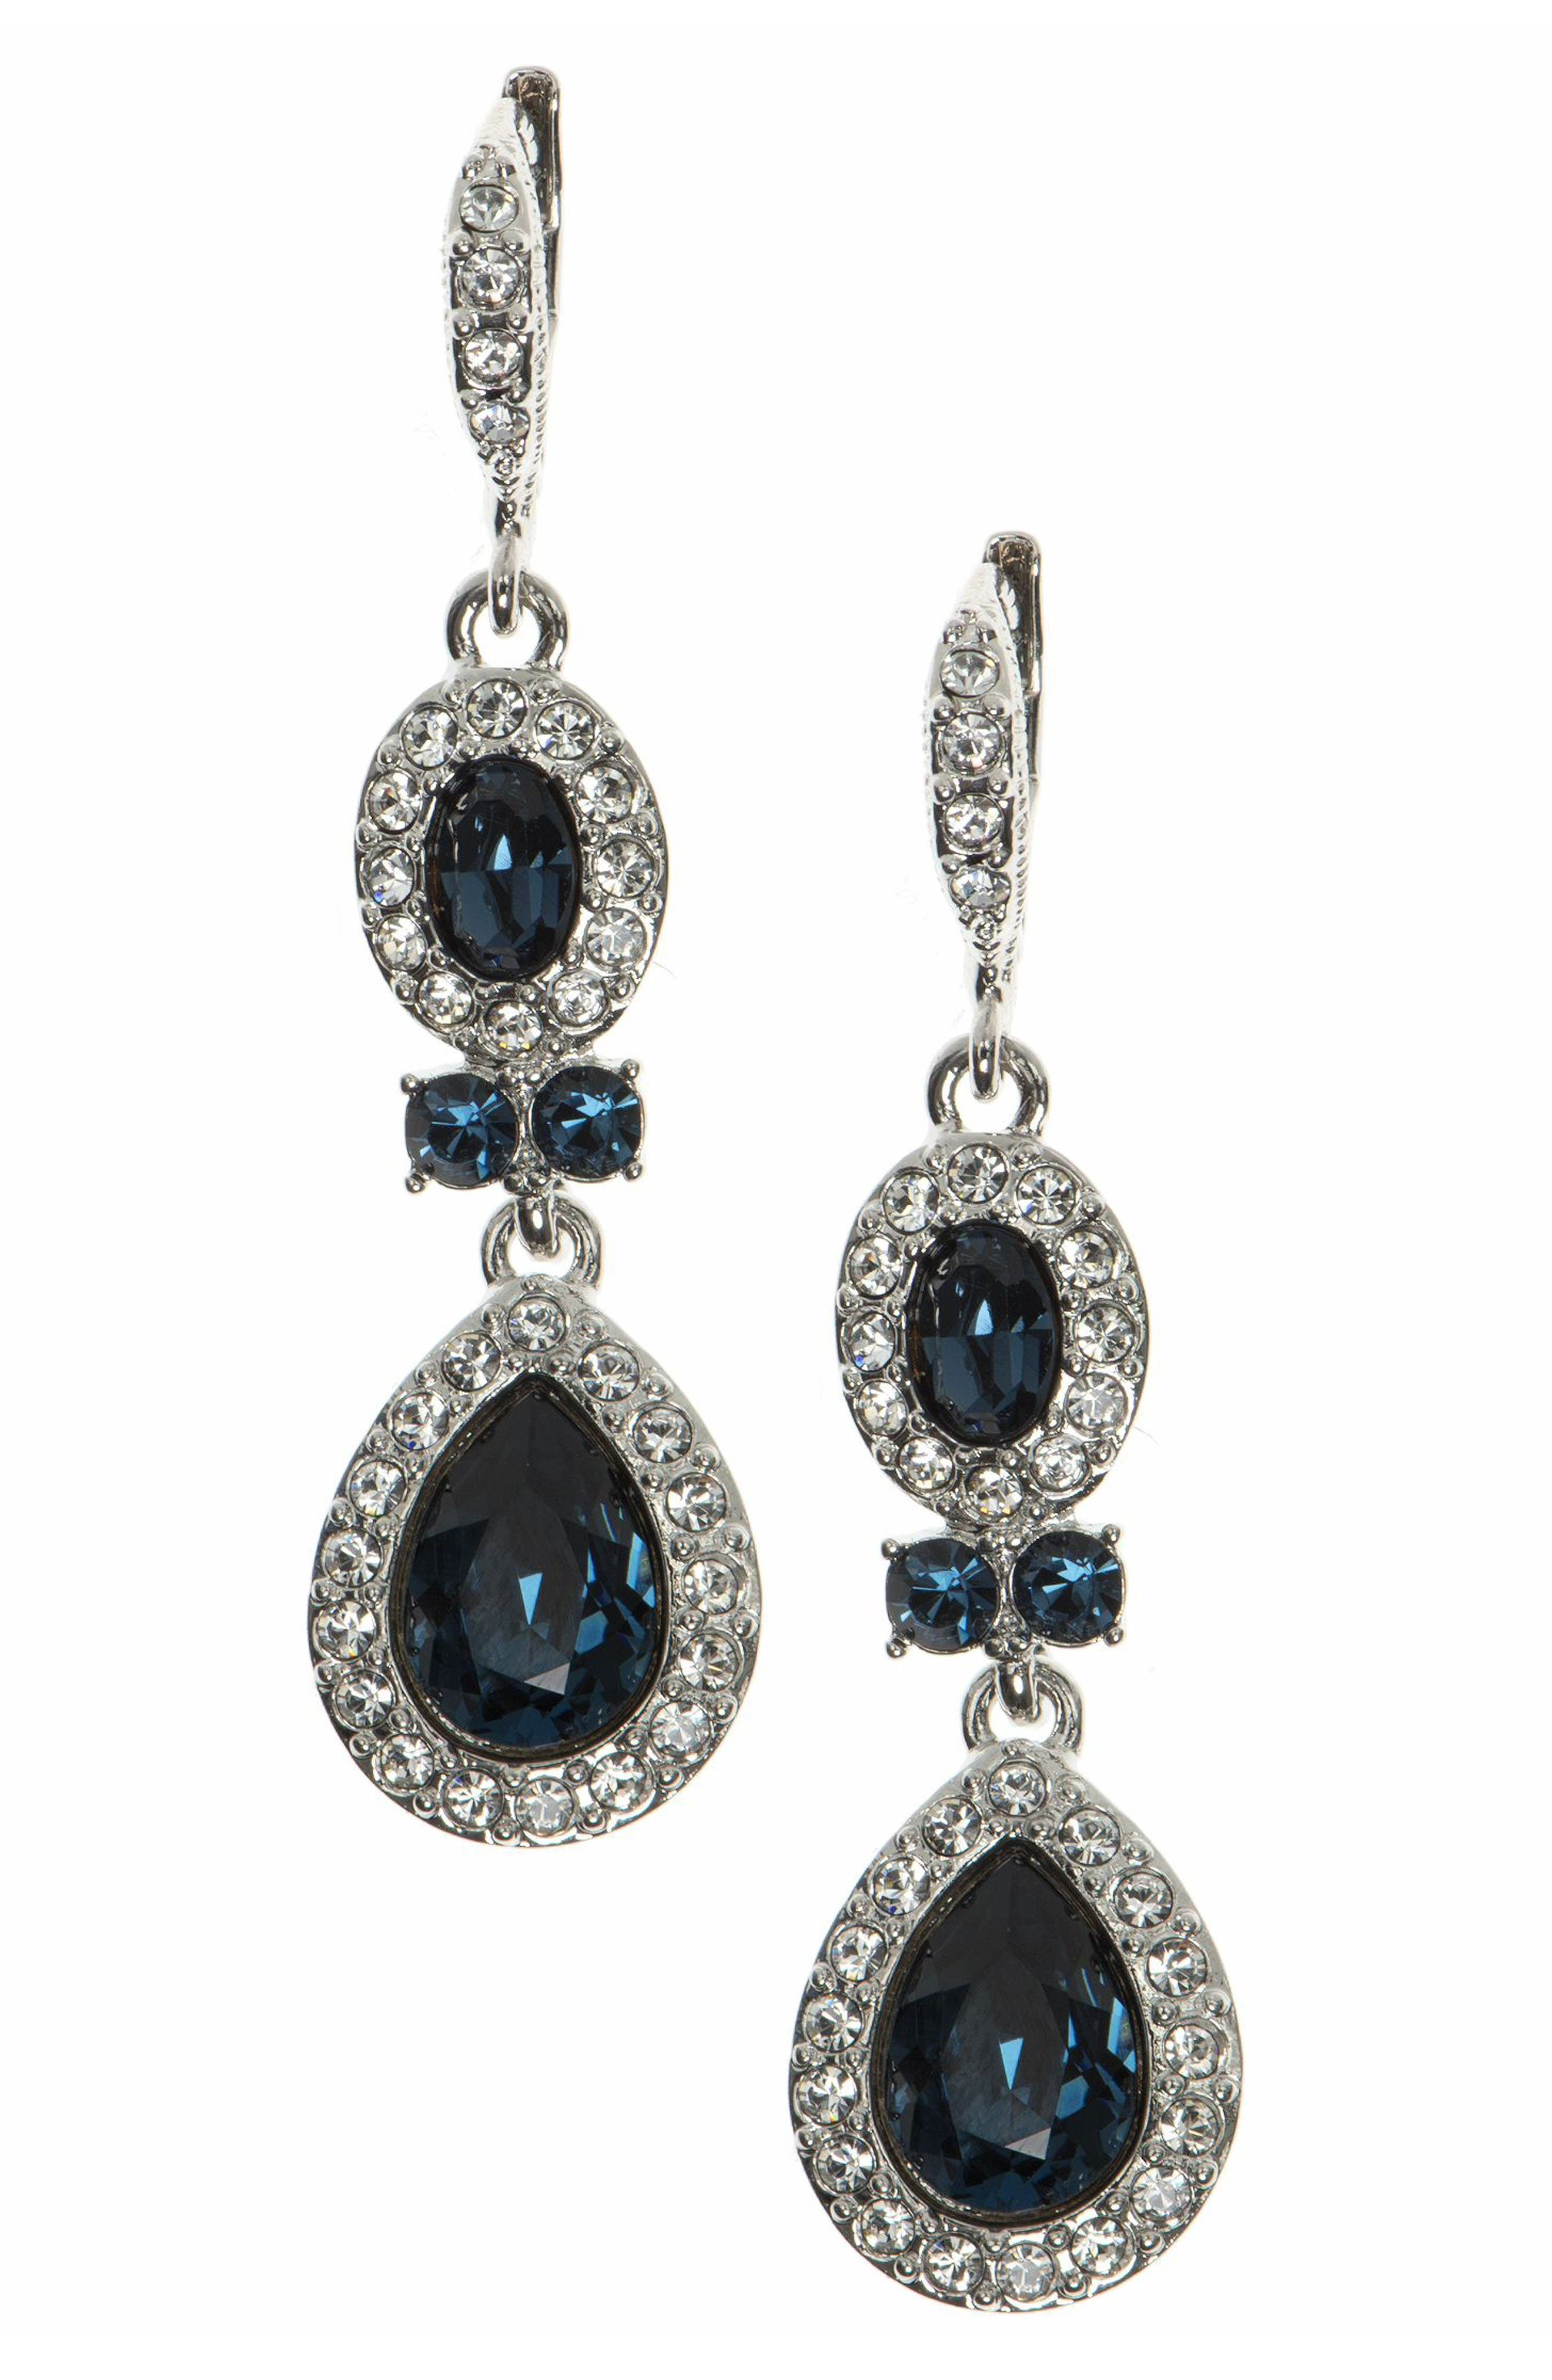 Pear Double Drop Earrings,                         Main,                         color, Blue / Silver